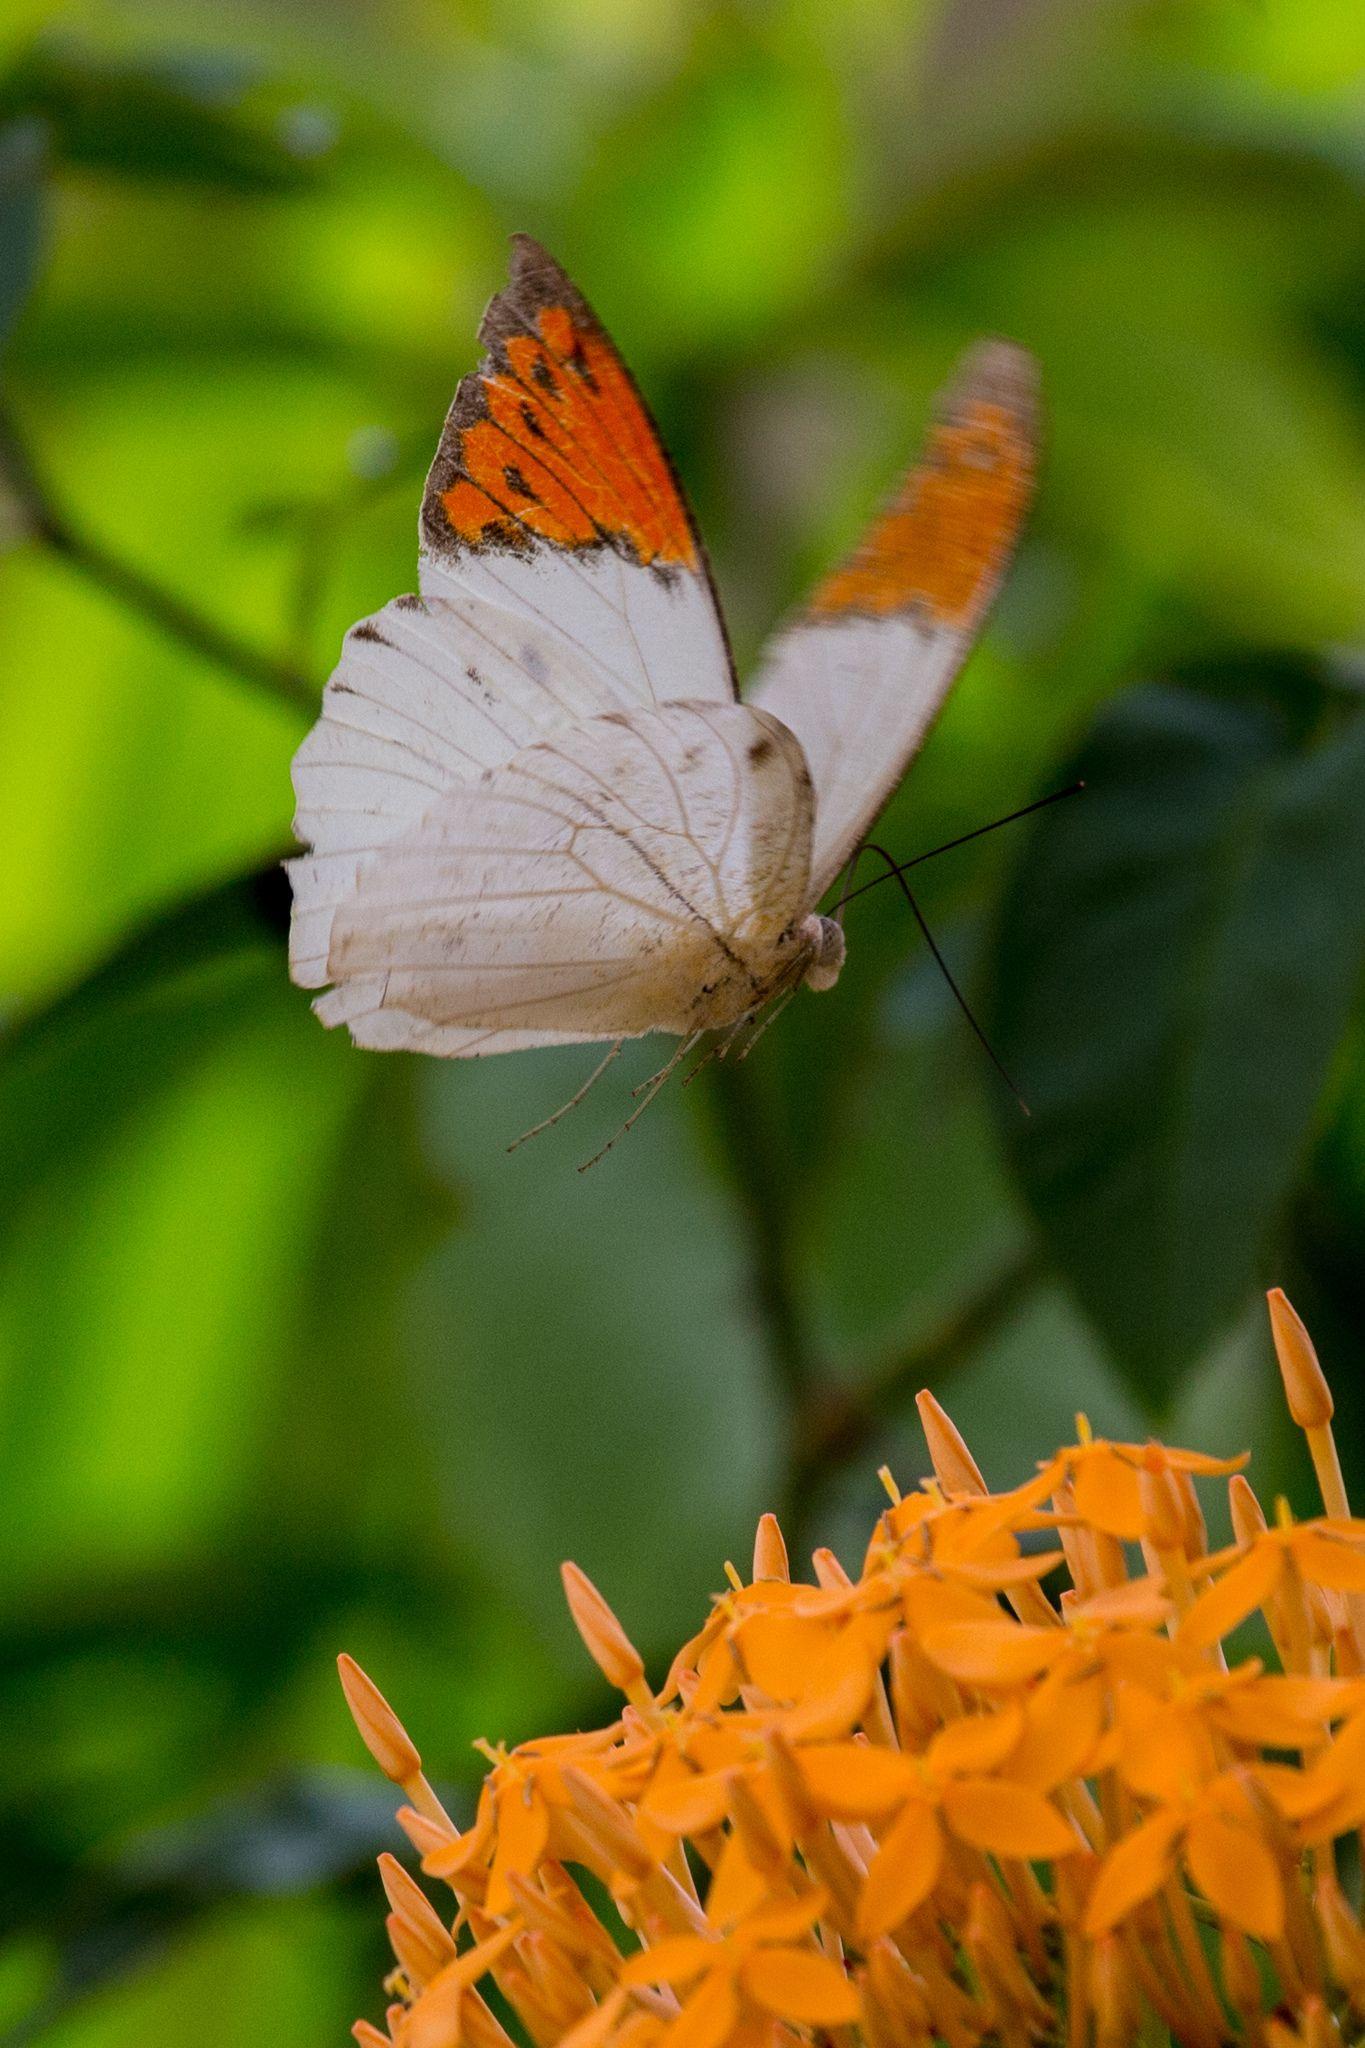 Great Orange Tip Butterfly in flight! Approaching to land on loveliness. ...